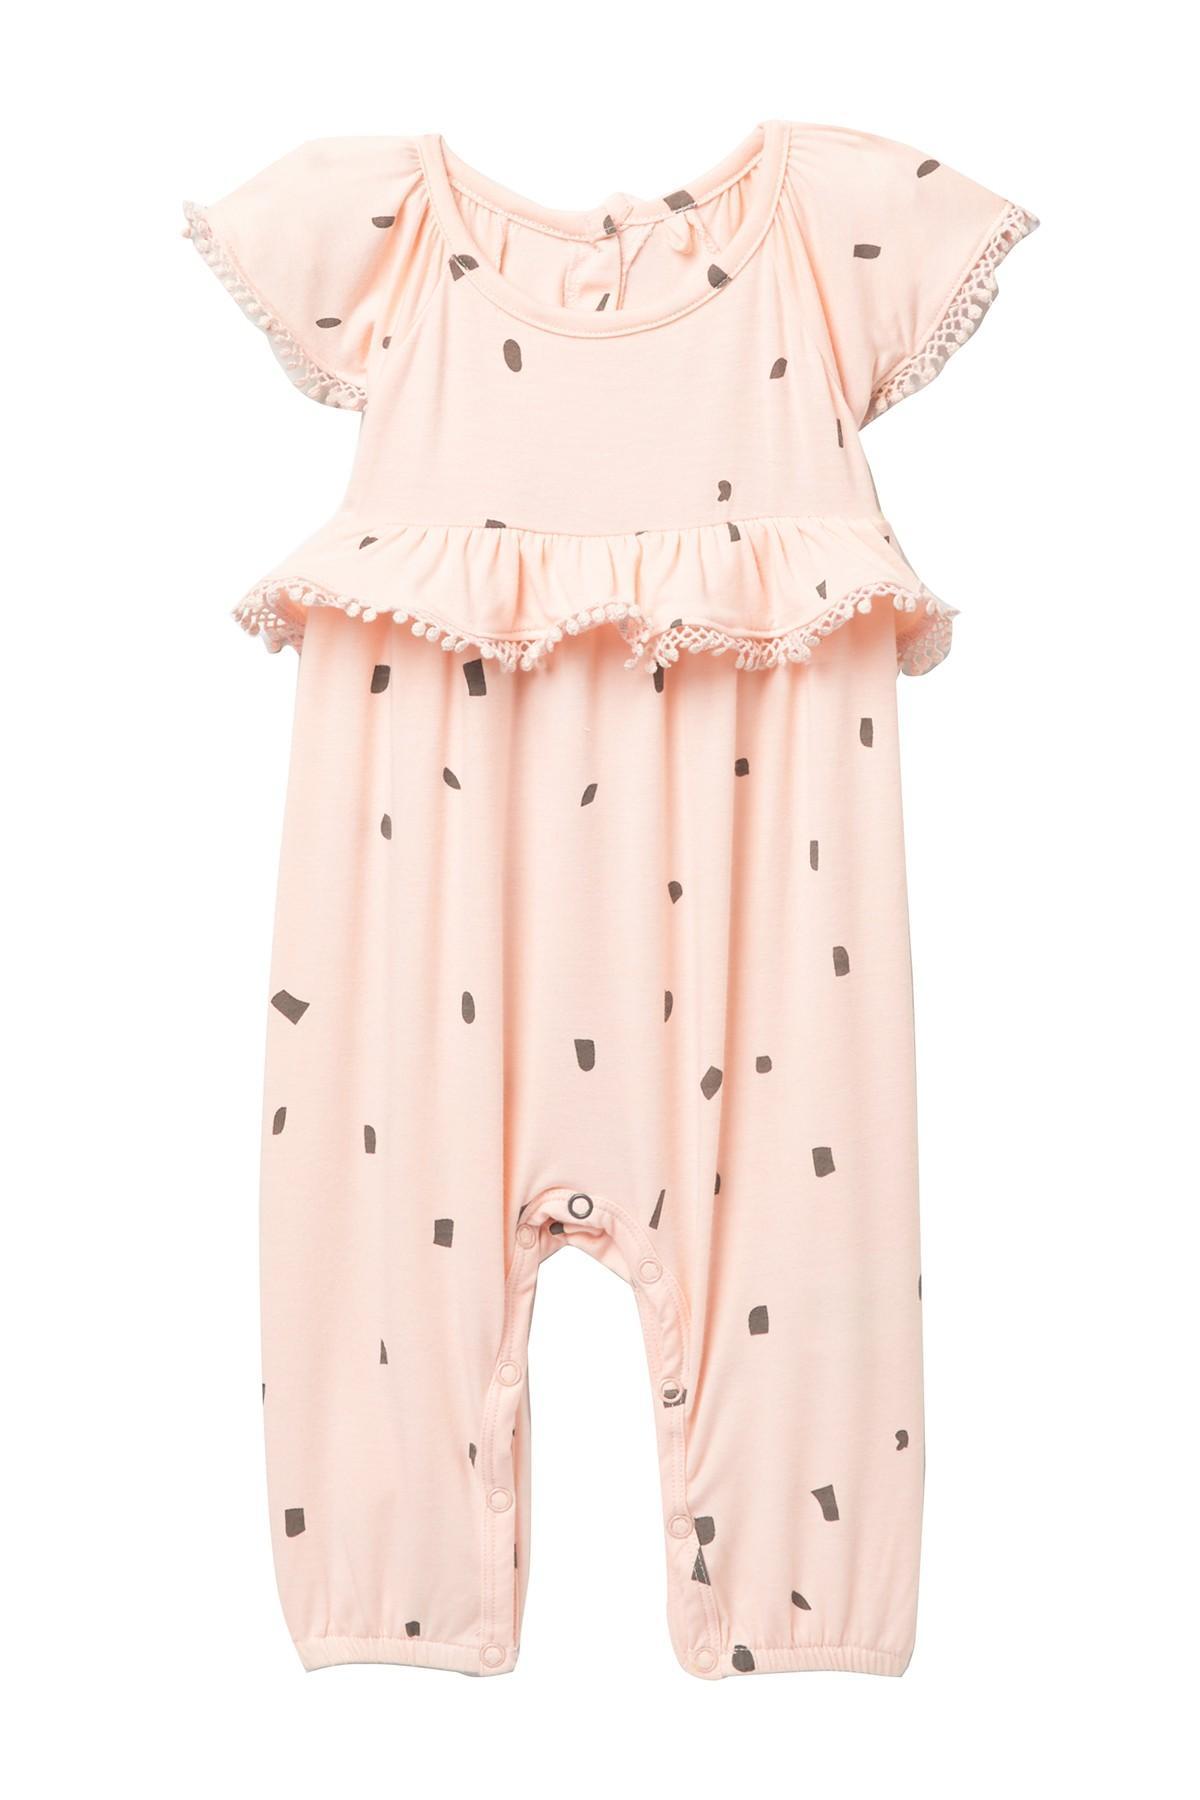 Jessica Simpson Peach Girls Medium Kitty Flared Pants Pink M